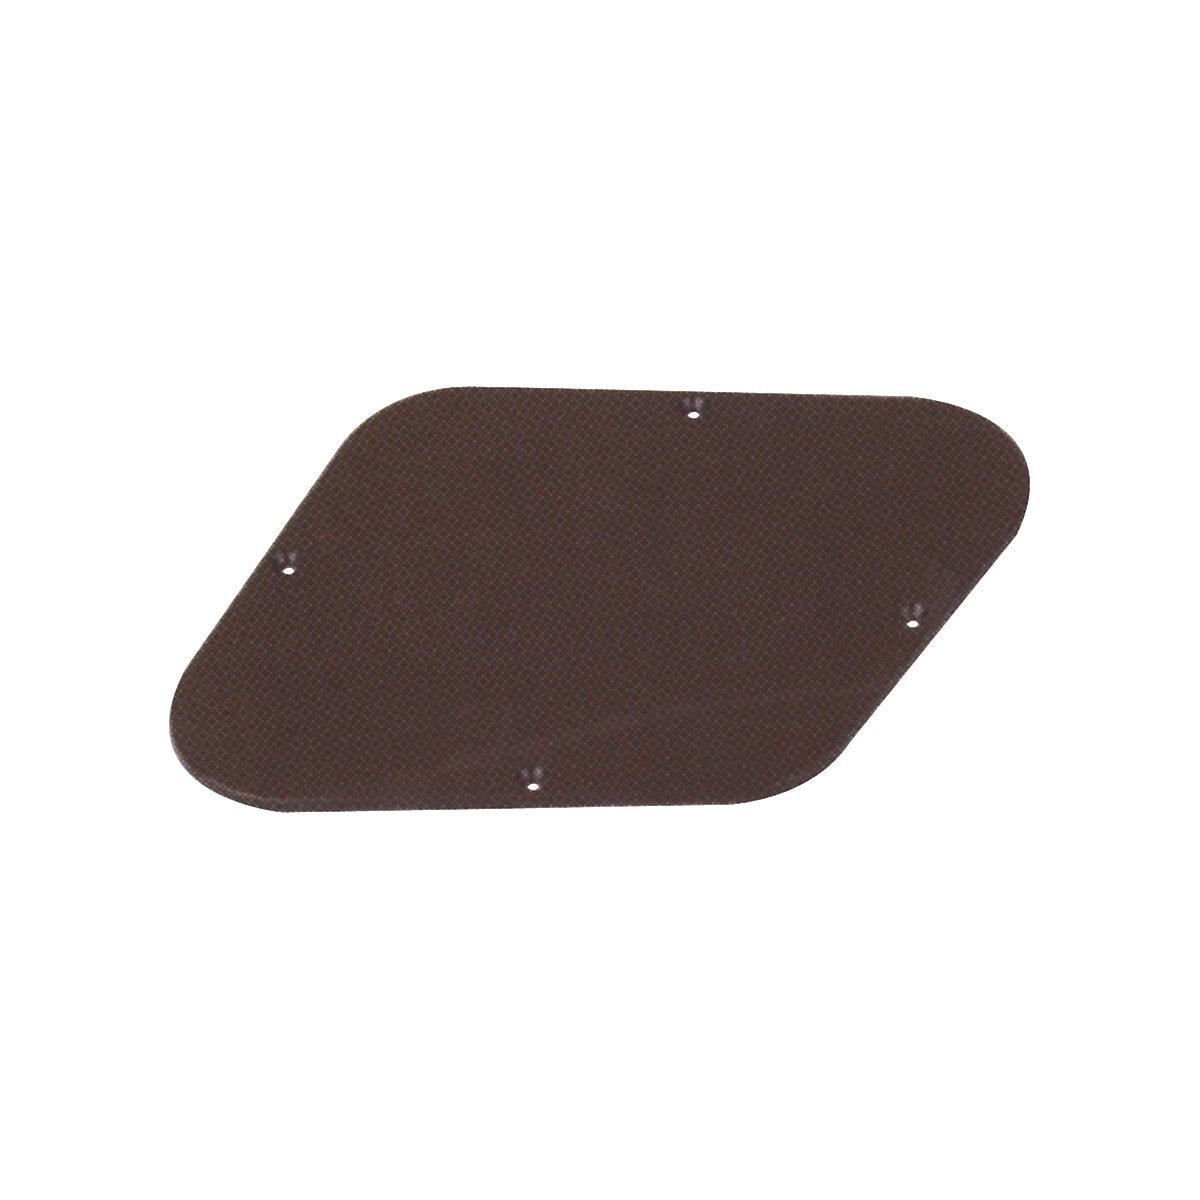 Gibson Gear PRCP-010 Control Plate, Black